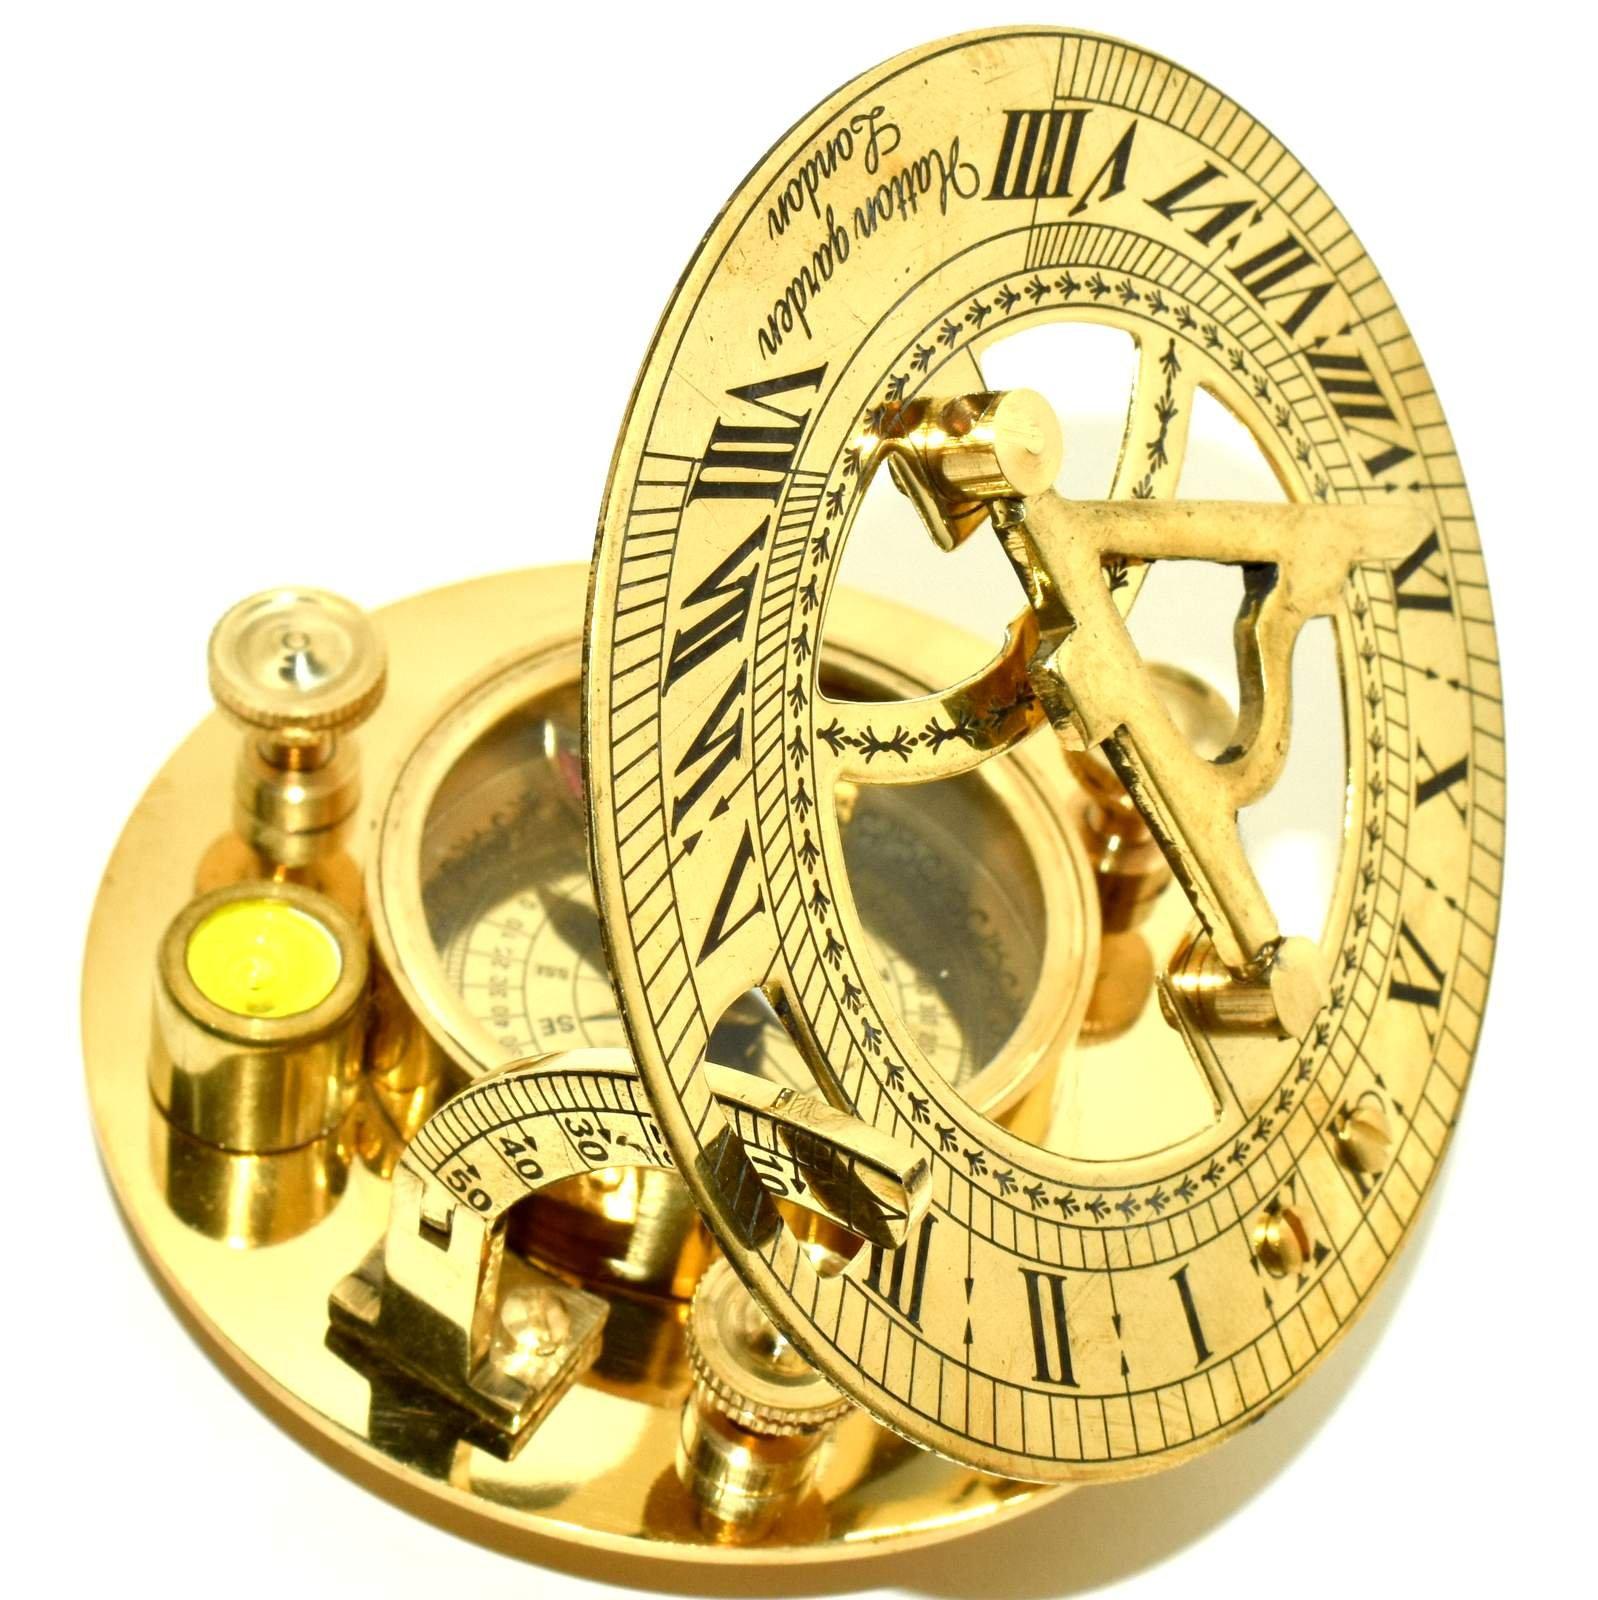 Premium Quality Nautical Antique Brass Sundial Compass w/ Spirit Level 2 Pieces